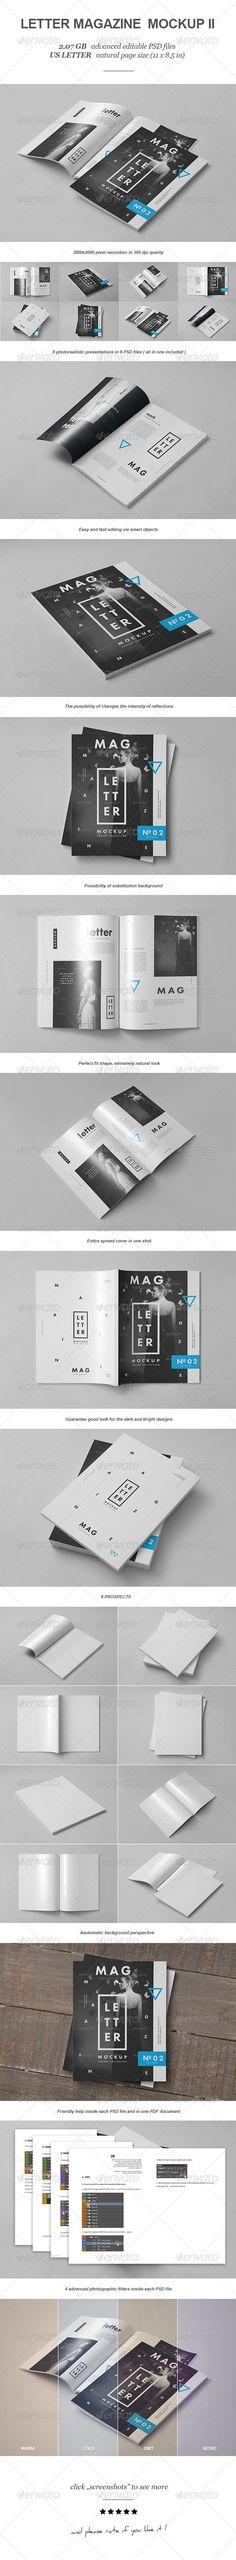 Letter Magazine / Brochure Mock-up II Download here: https://graphicriver.net/item/letter-magazine-brochure-mockup-ii/8234615?ref=KlitVogli